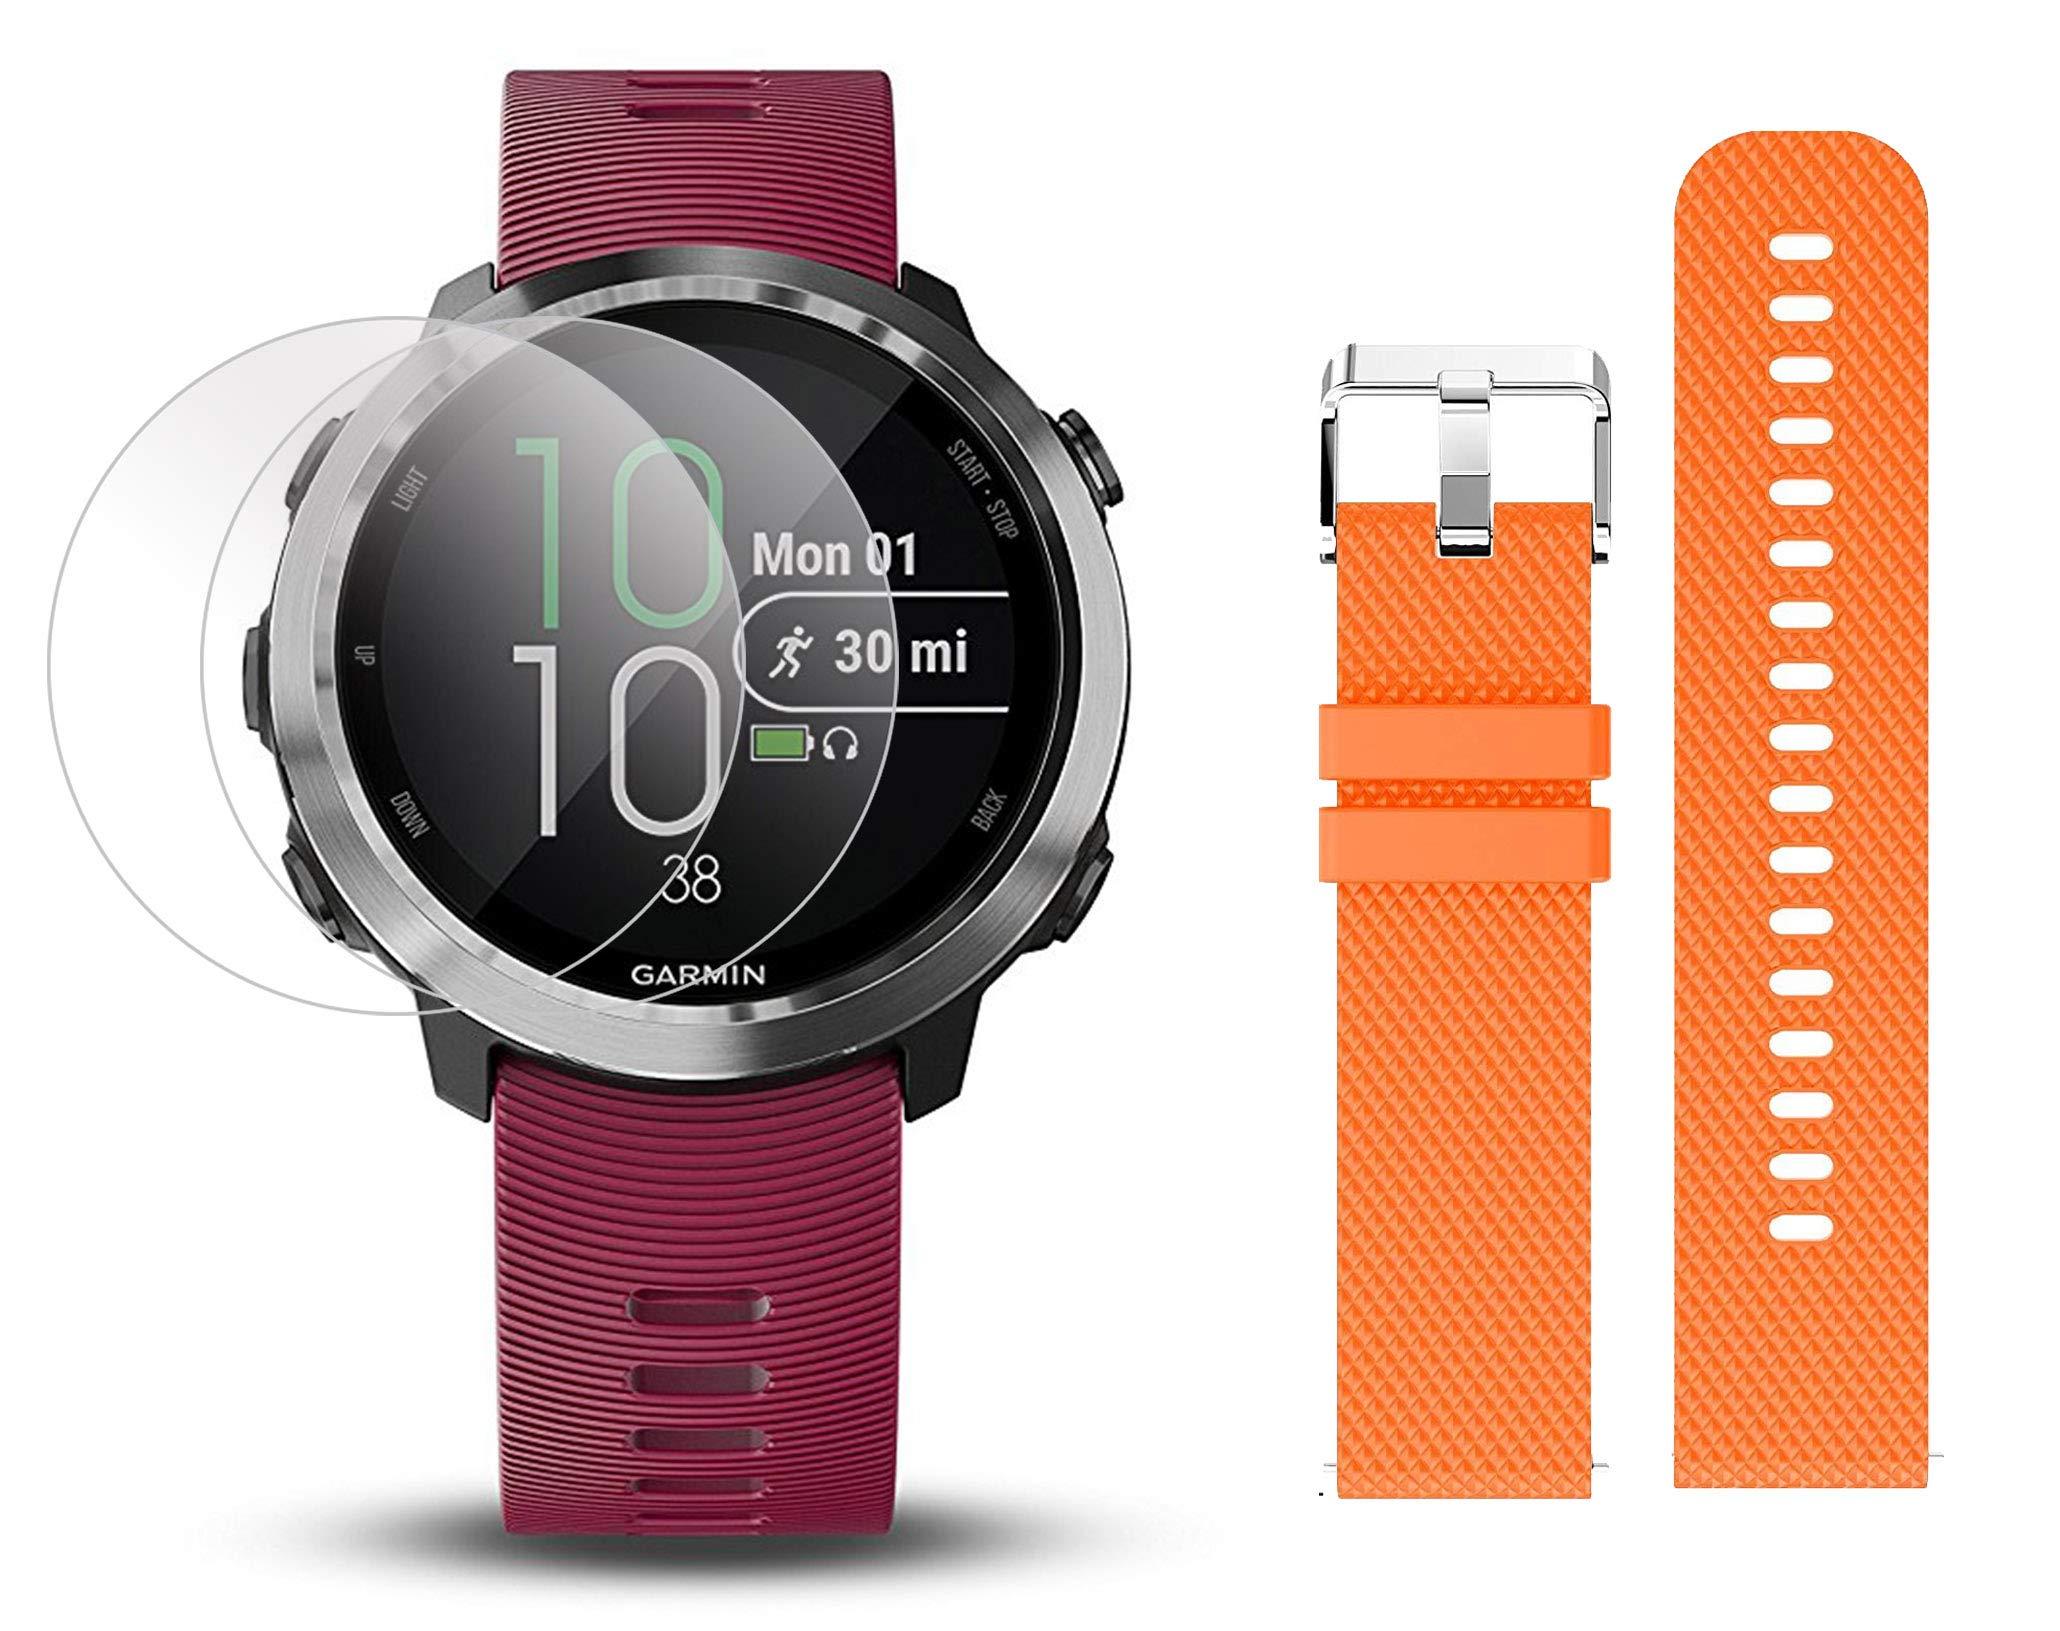 Garmin Forerunner 645 Music Bundle with Extra Band & HD Screen Protector Film (x4) | Running GPS Watch, Wrist HR, Music & Spotify, Garmin Pay (Cerise + Music, Orange)